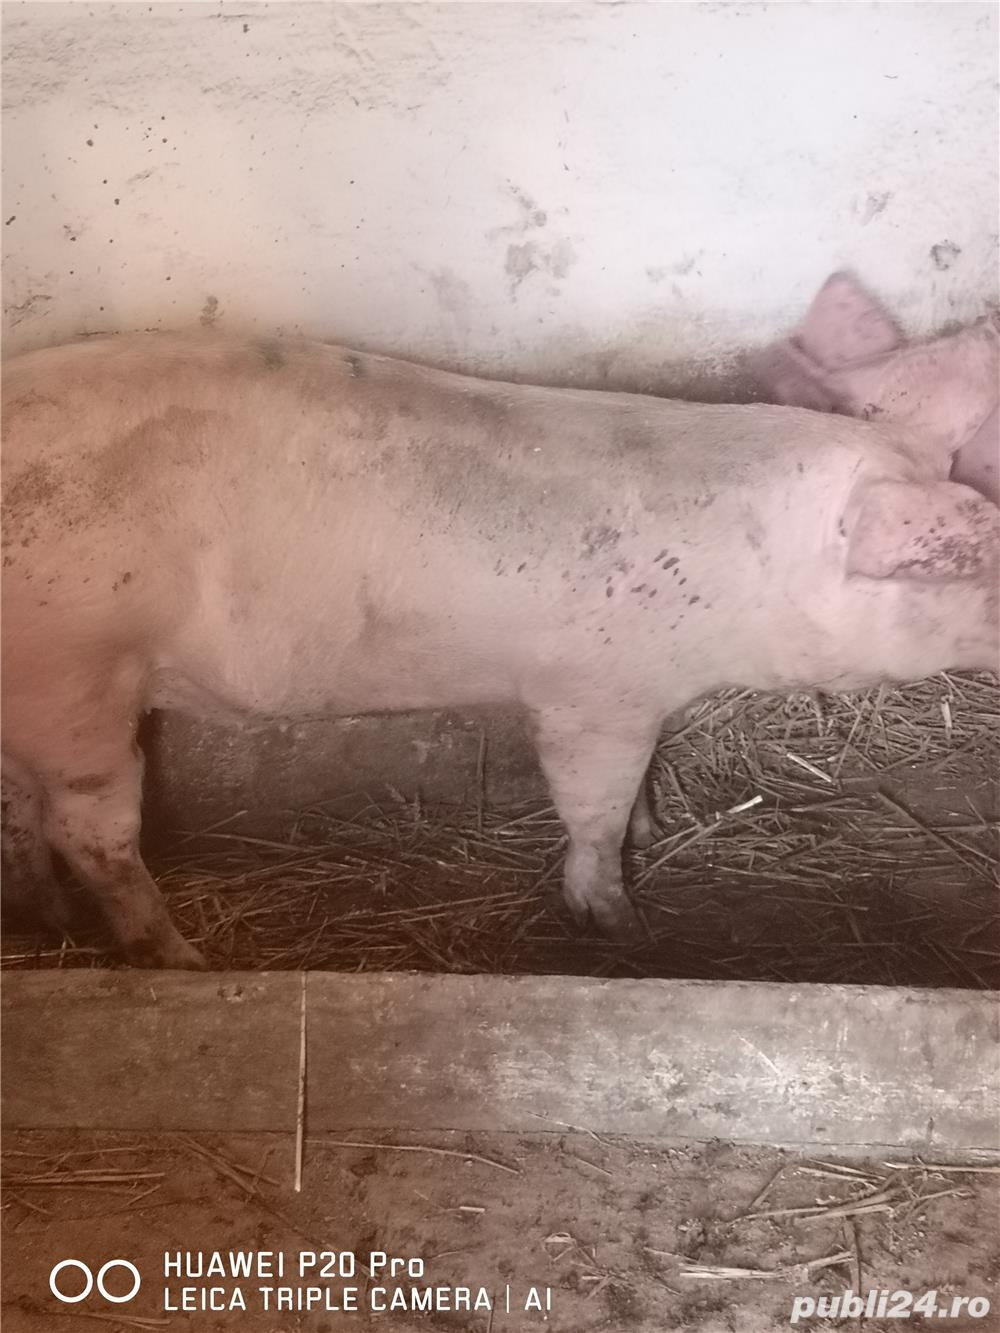 Vând porci de carne 120-130 kg